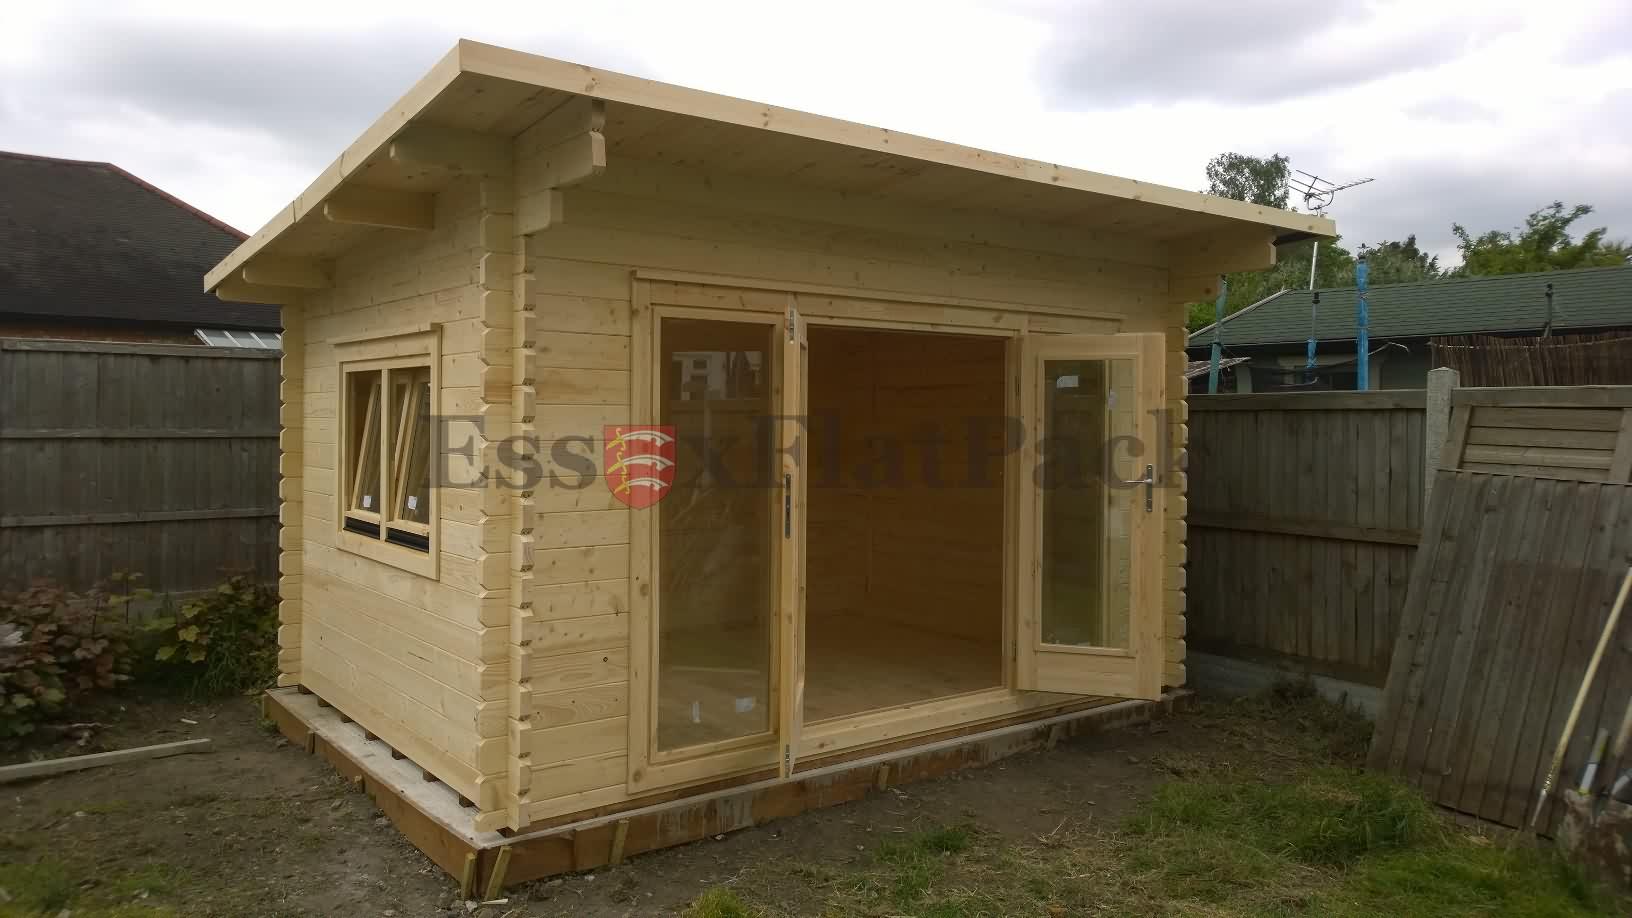 essexflatpack-log-cabins-20150522152304.jpg